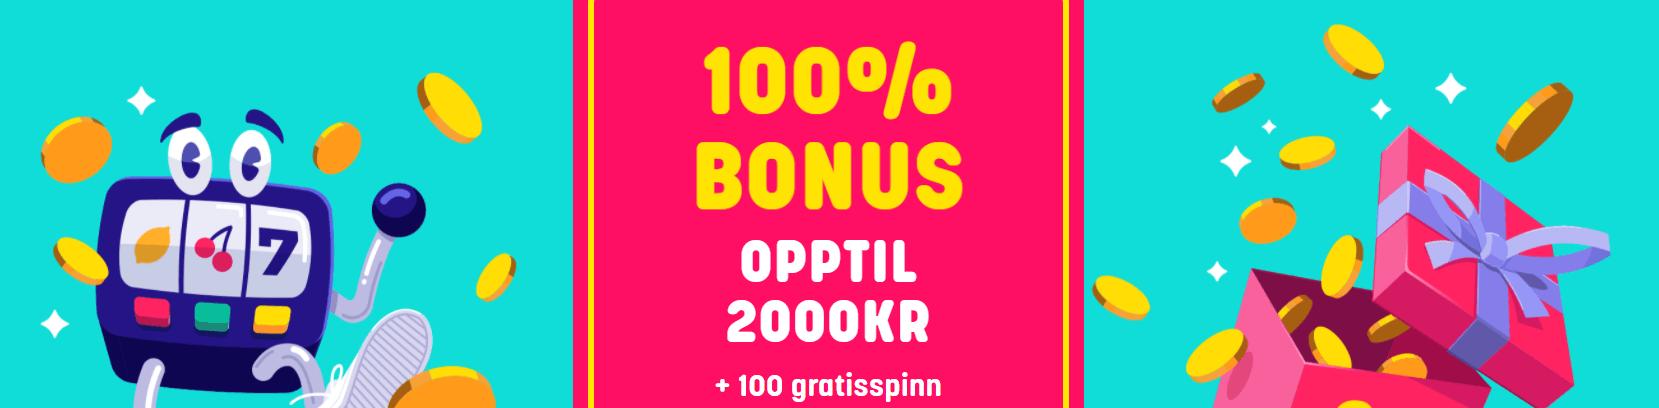 caxino no 2000 kr bonus og 100 free spins